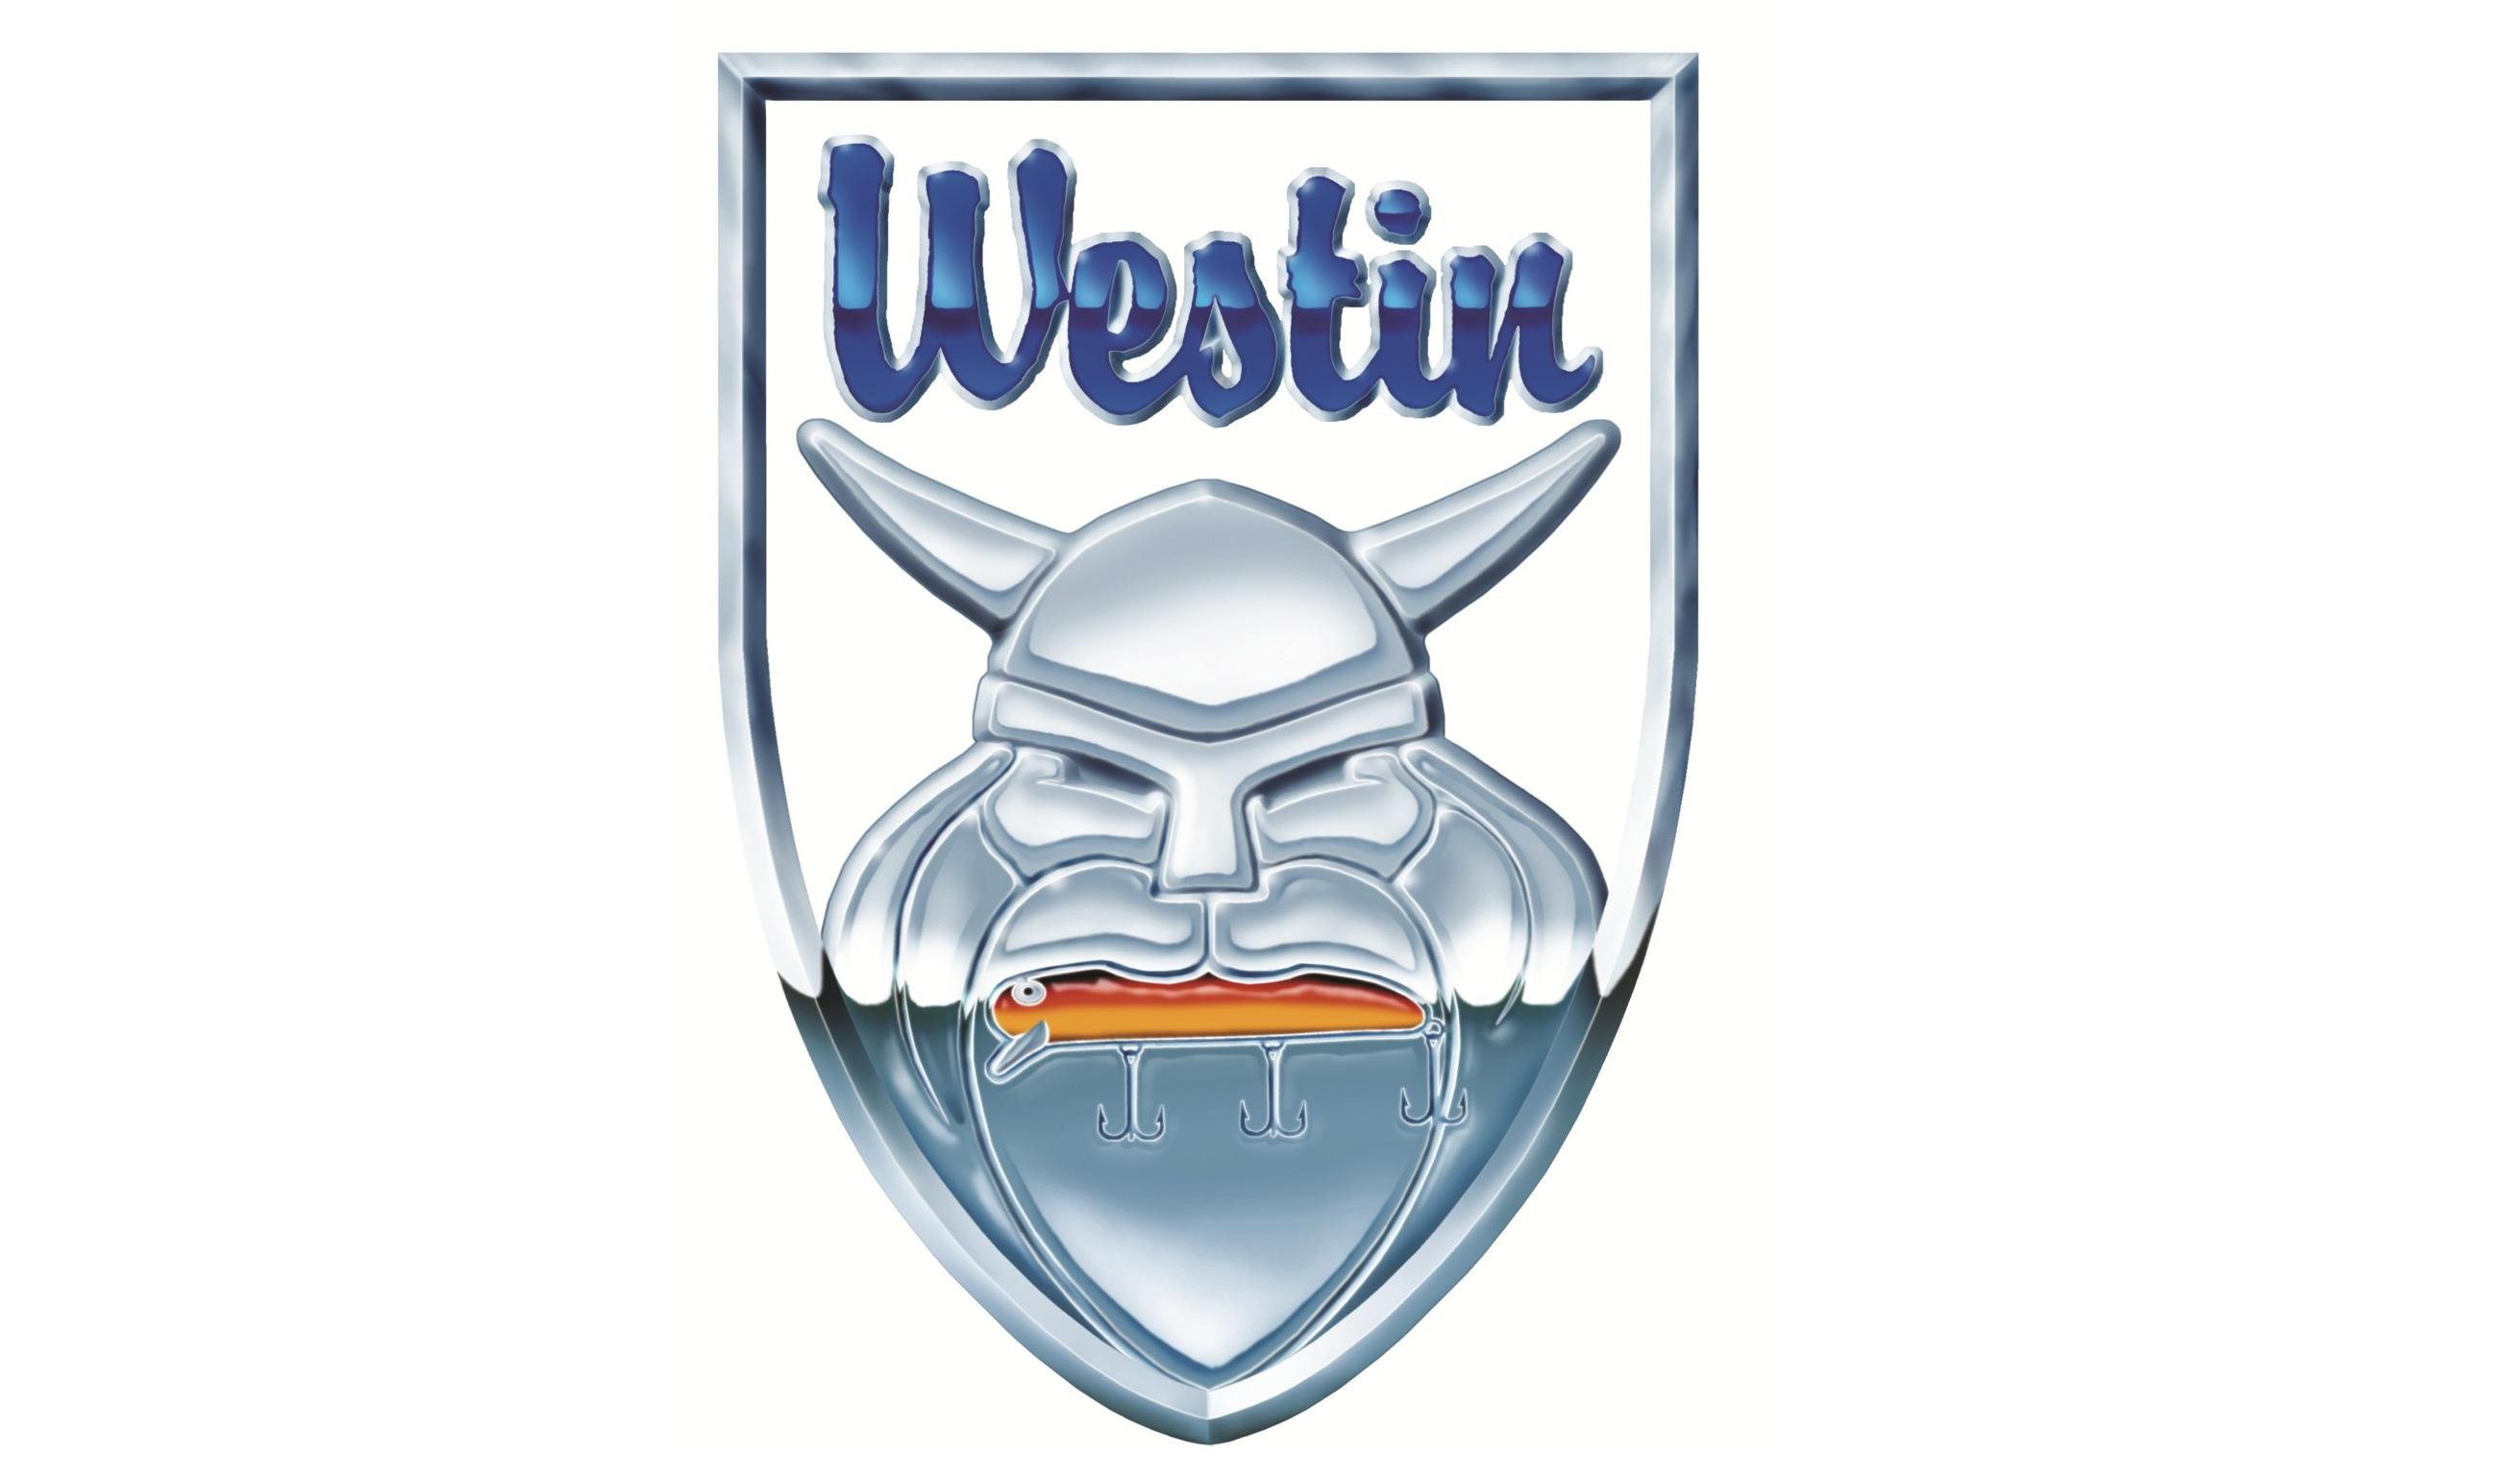 Westins